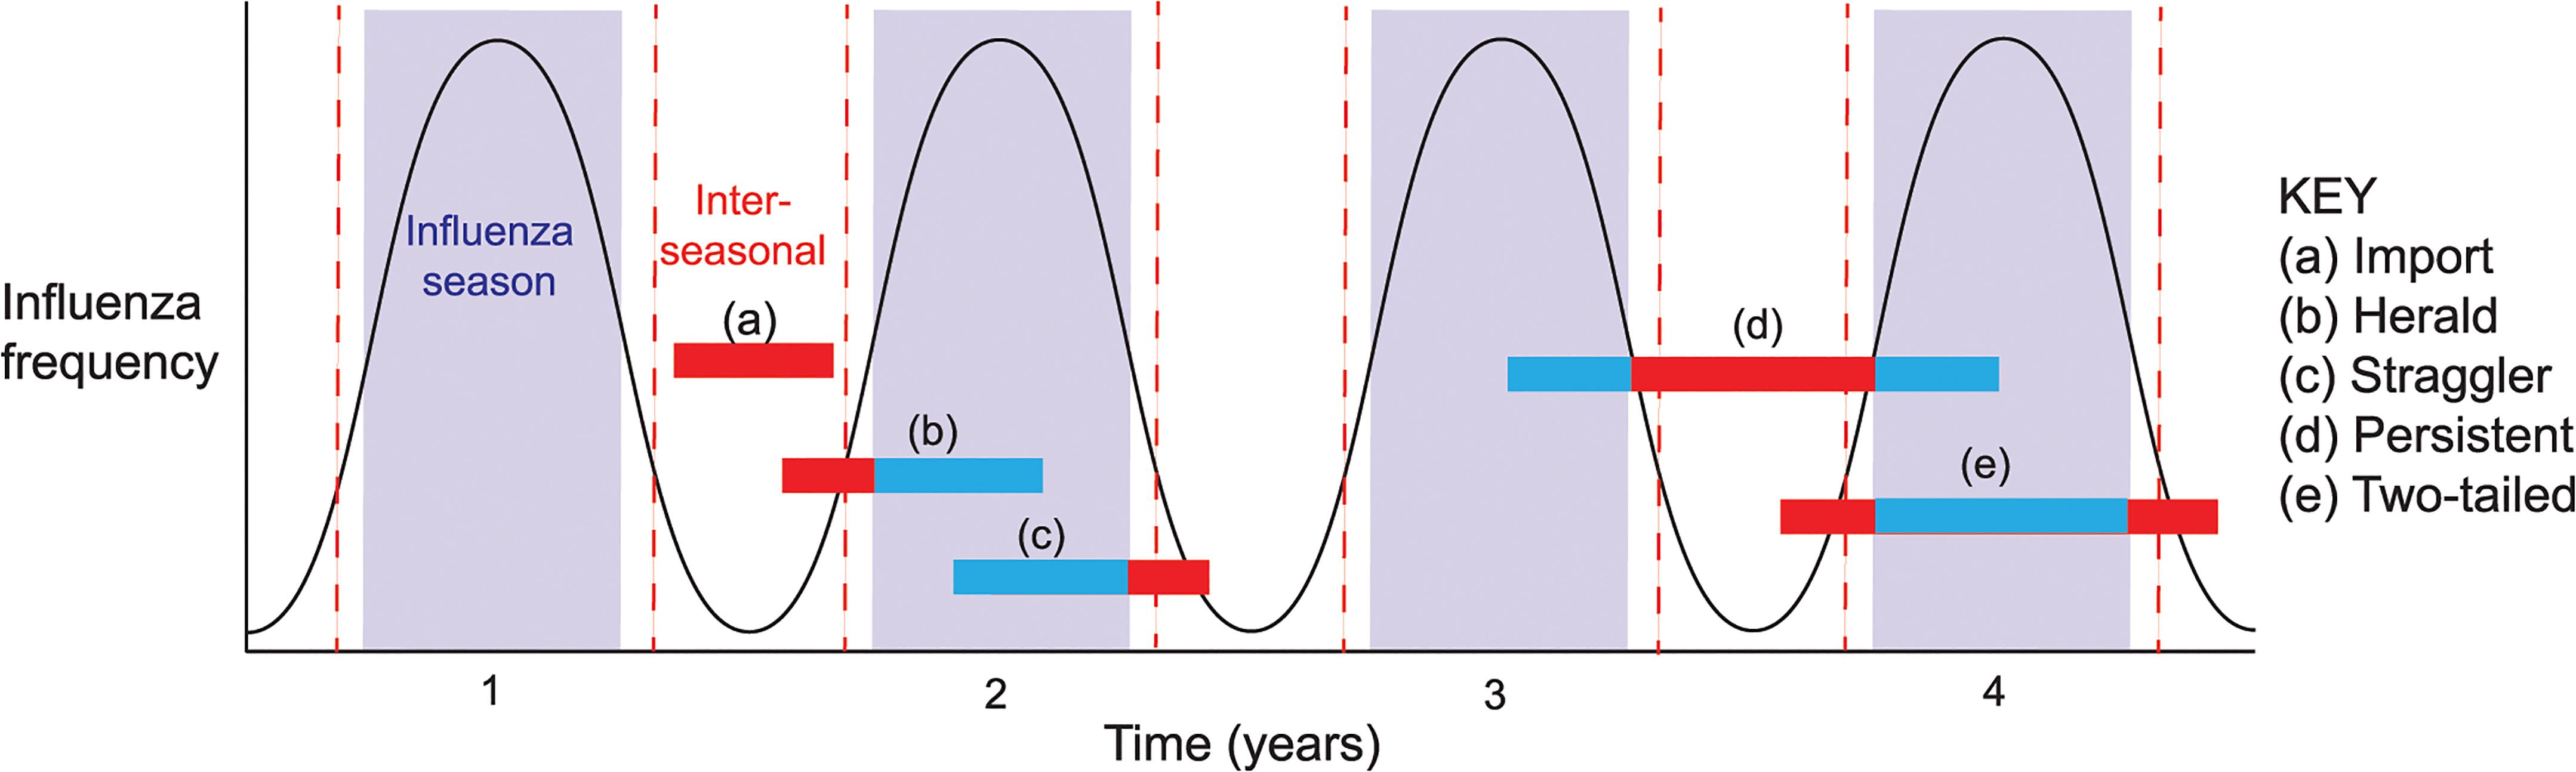 Patterns (event types) of inter-seasonal influenza transmission.